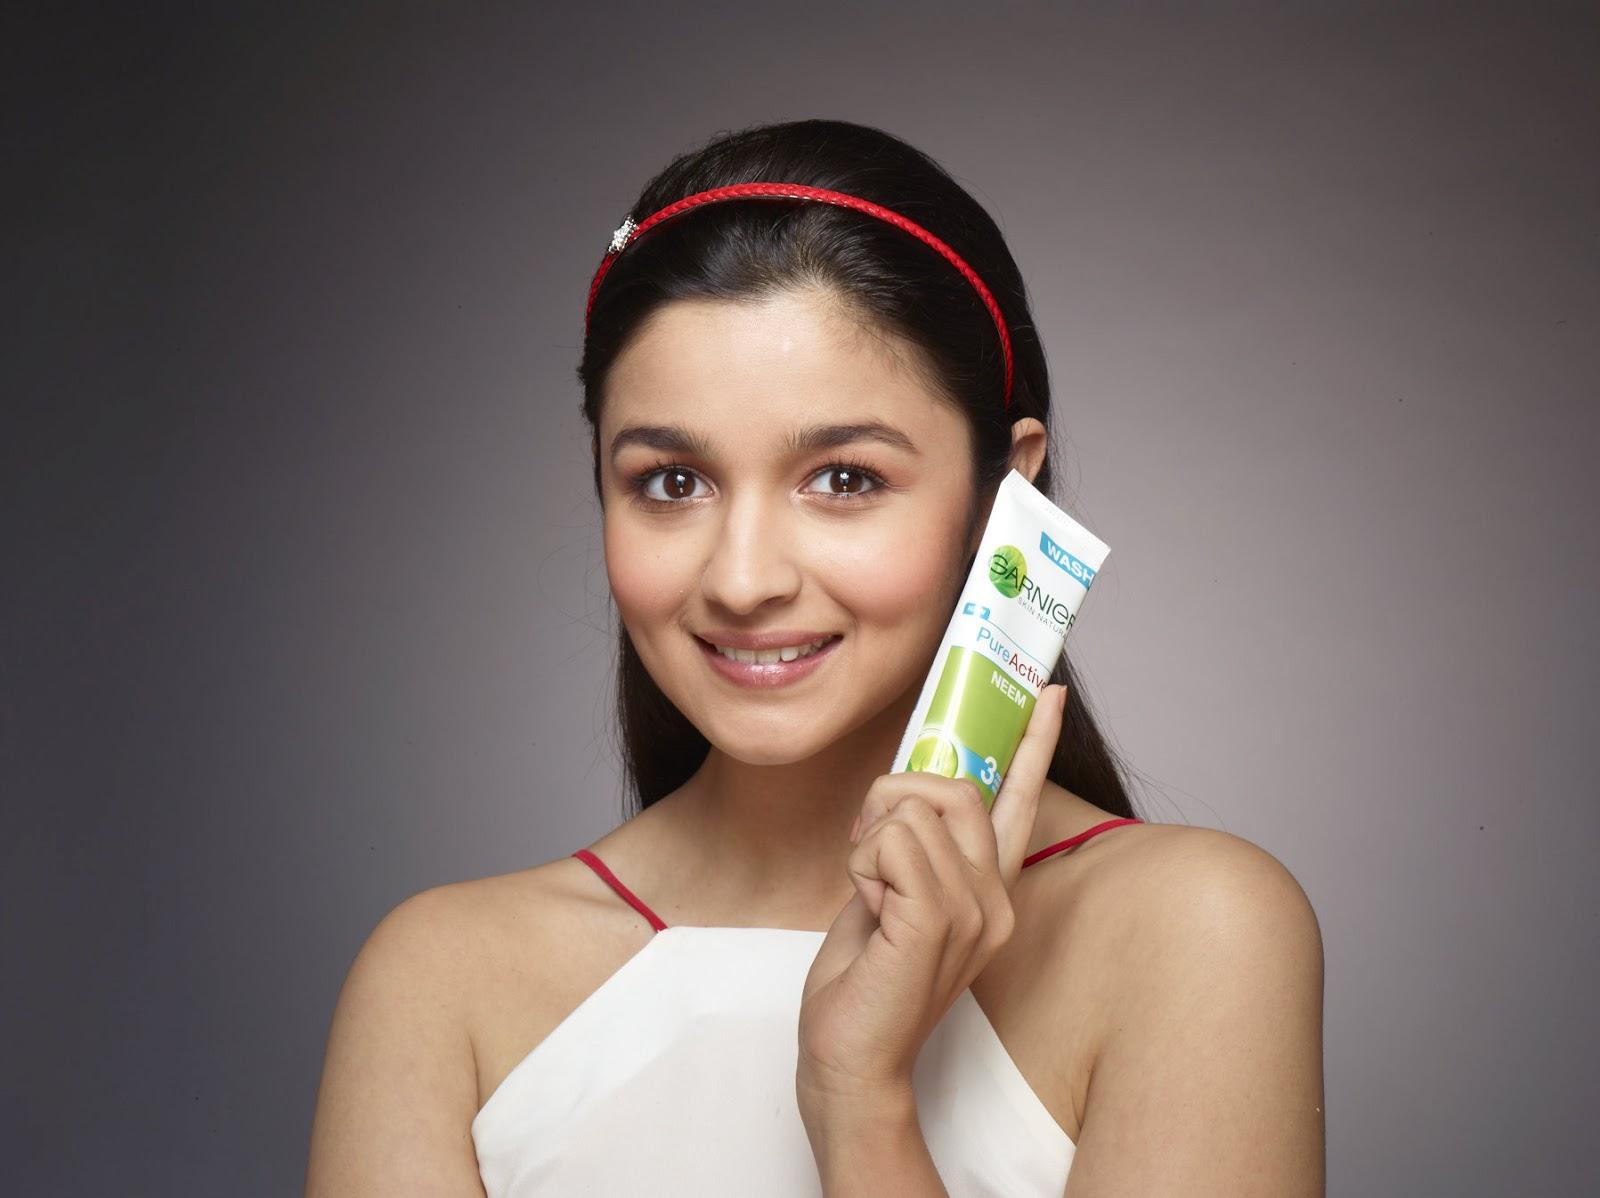 PunjabKesari, alia bhatt Beauty Secret Image, Bollywood Actress Beauty Secret Image